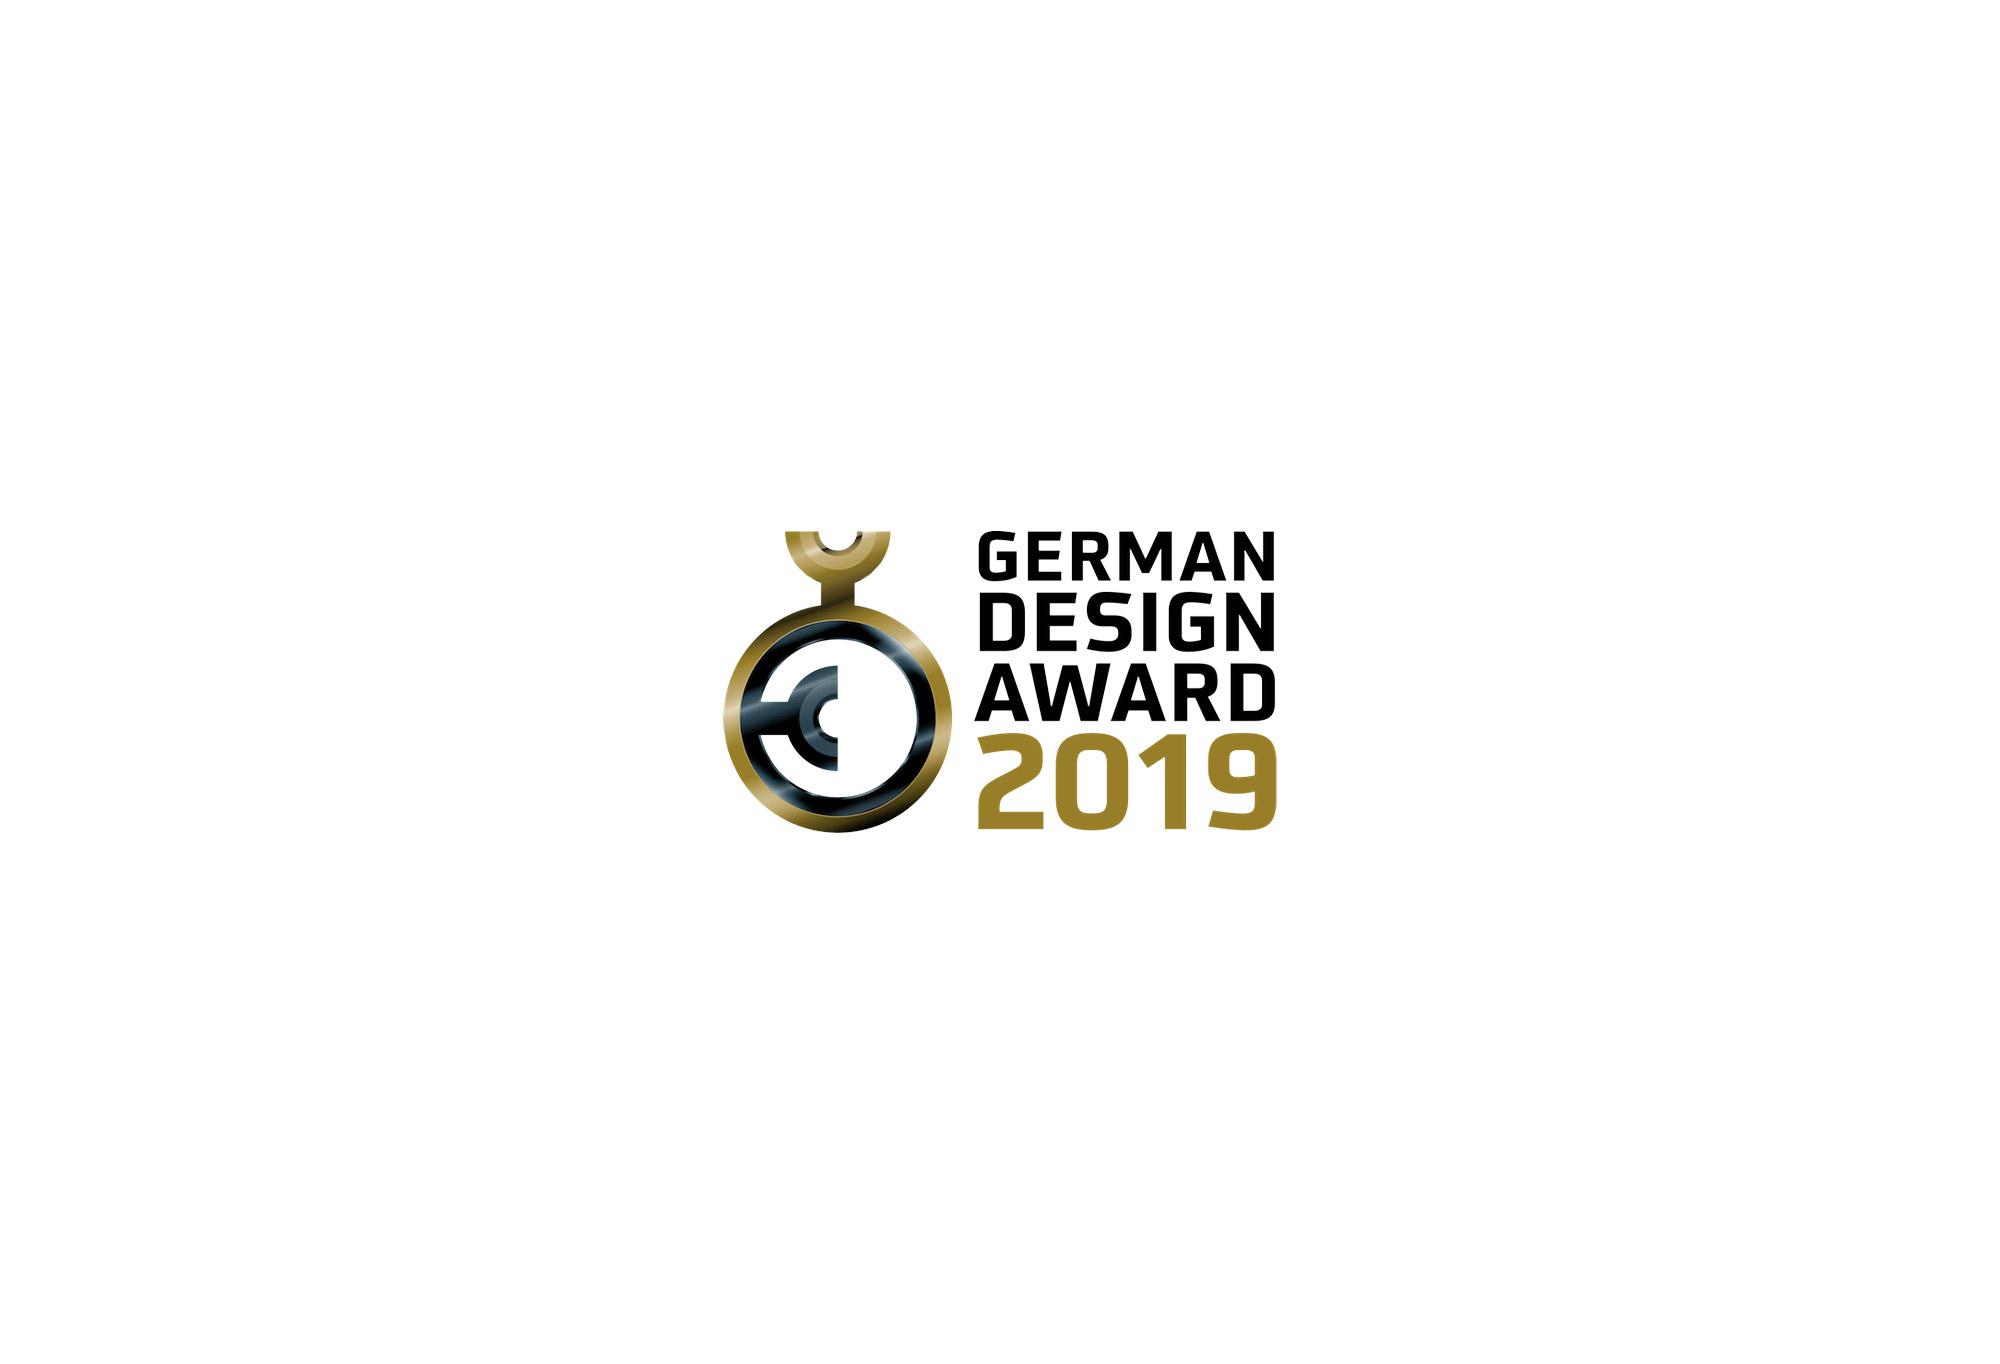 German Design Award 2019